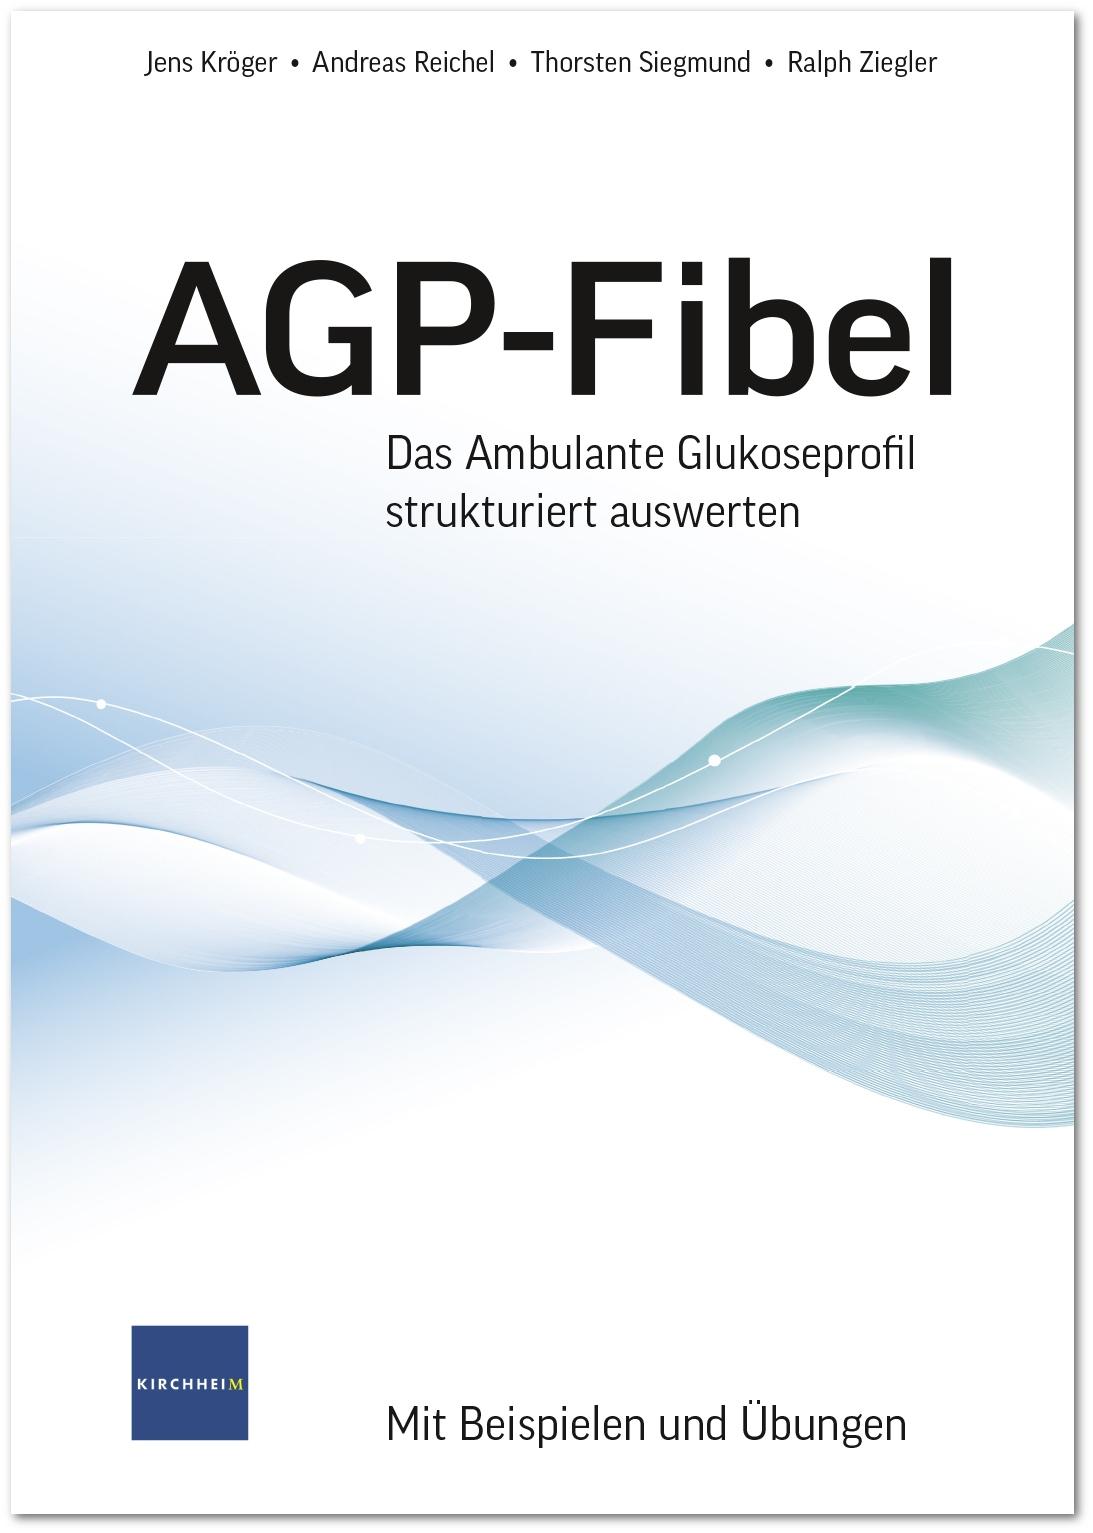 AGP-Fibel – Das ambulante Glukoseprofil strukturiert auswerten